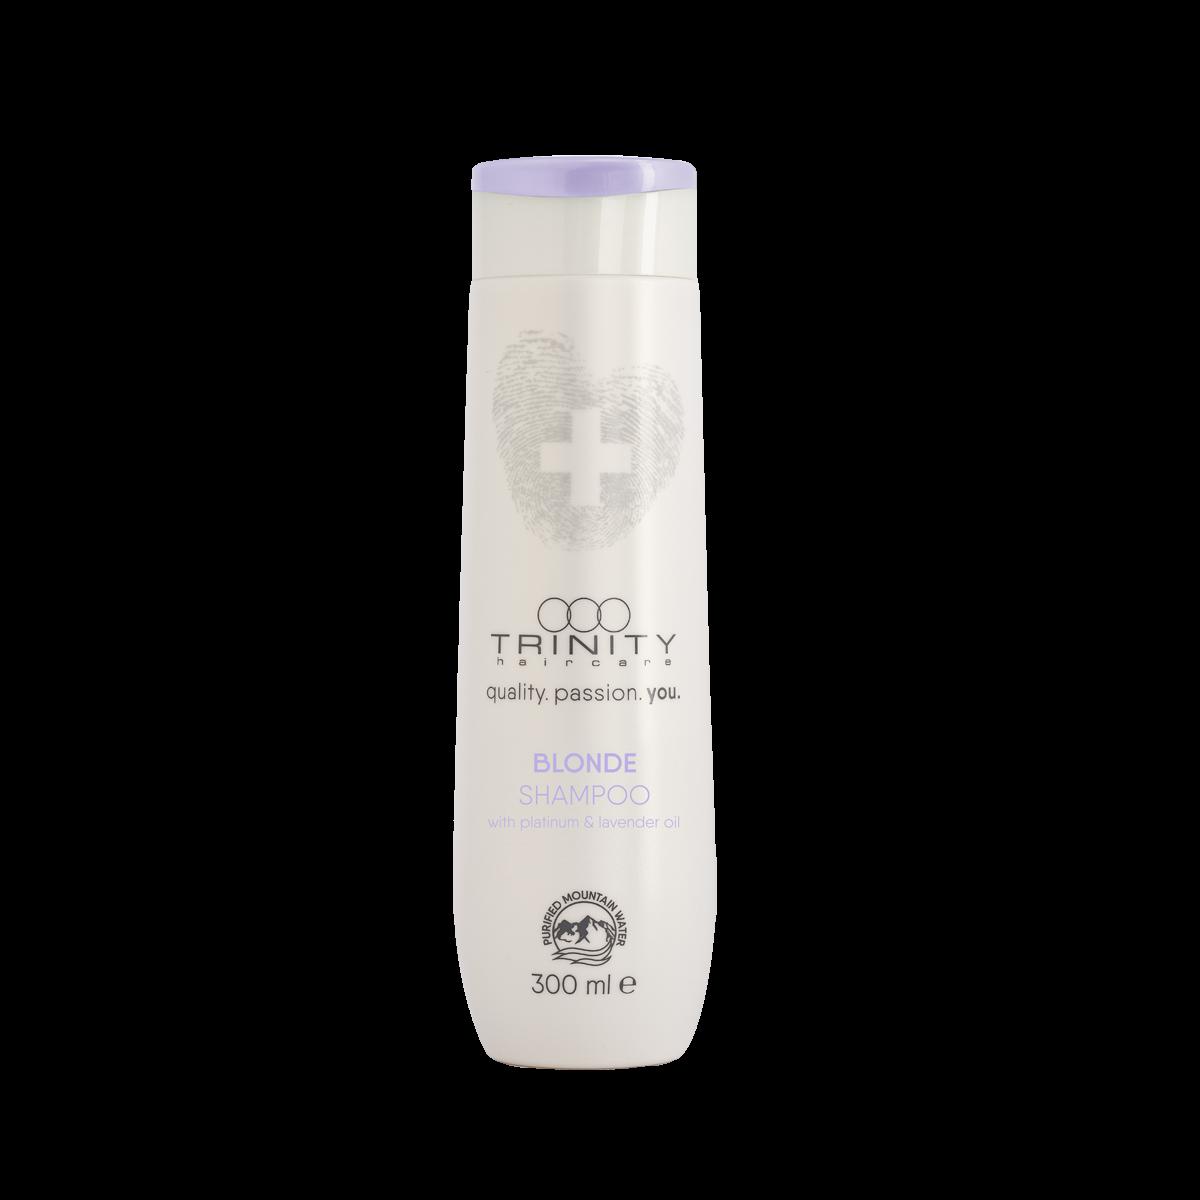 Trinity Hair Care Шампунь Essentials Blonde Shampoo для Окрашенных и Осветленных Волос, 300 мл cutrin шампунь для окрашенных волос colorism shampoo 300 мл